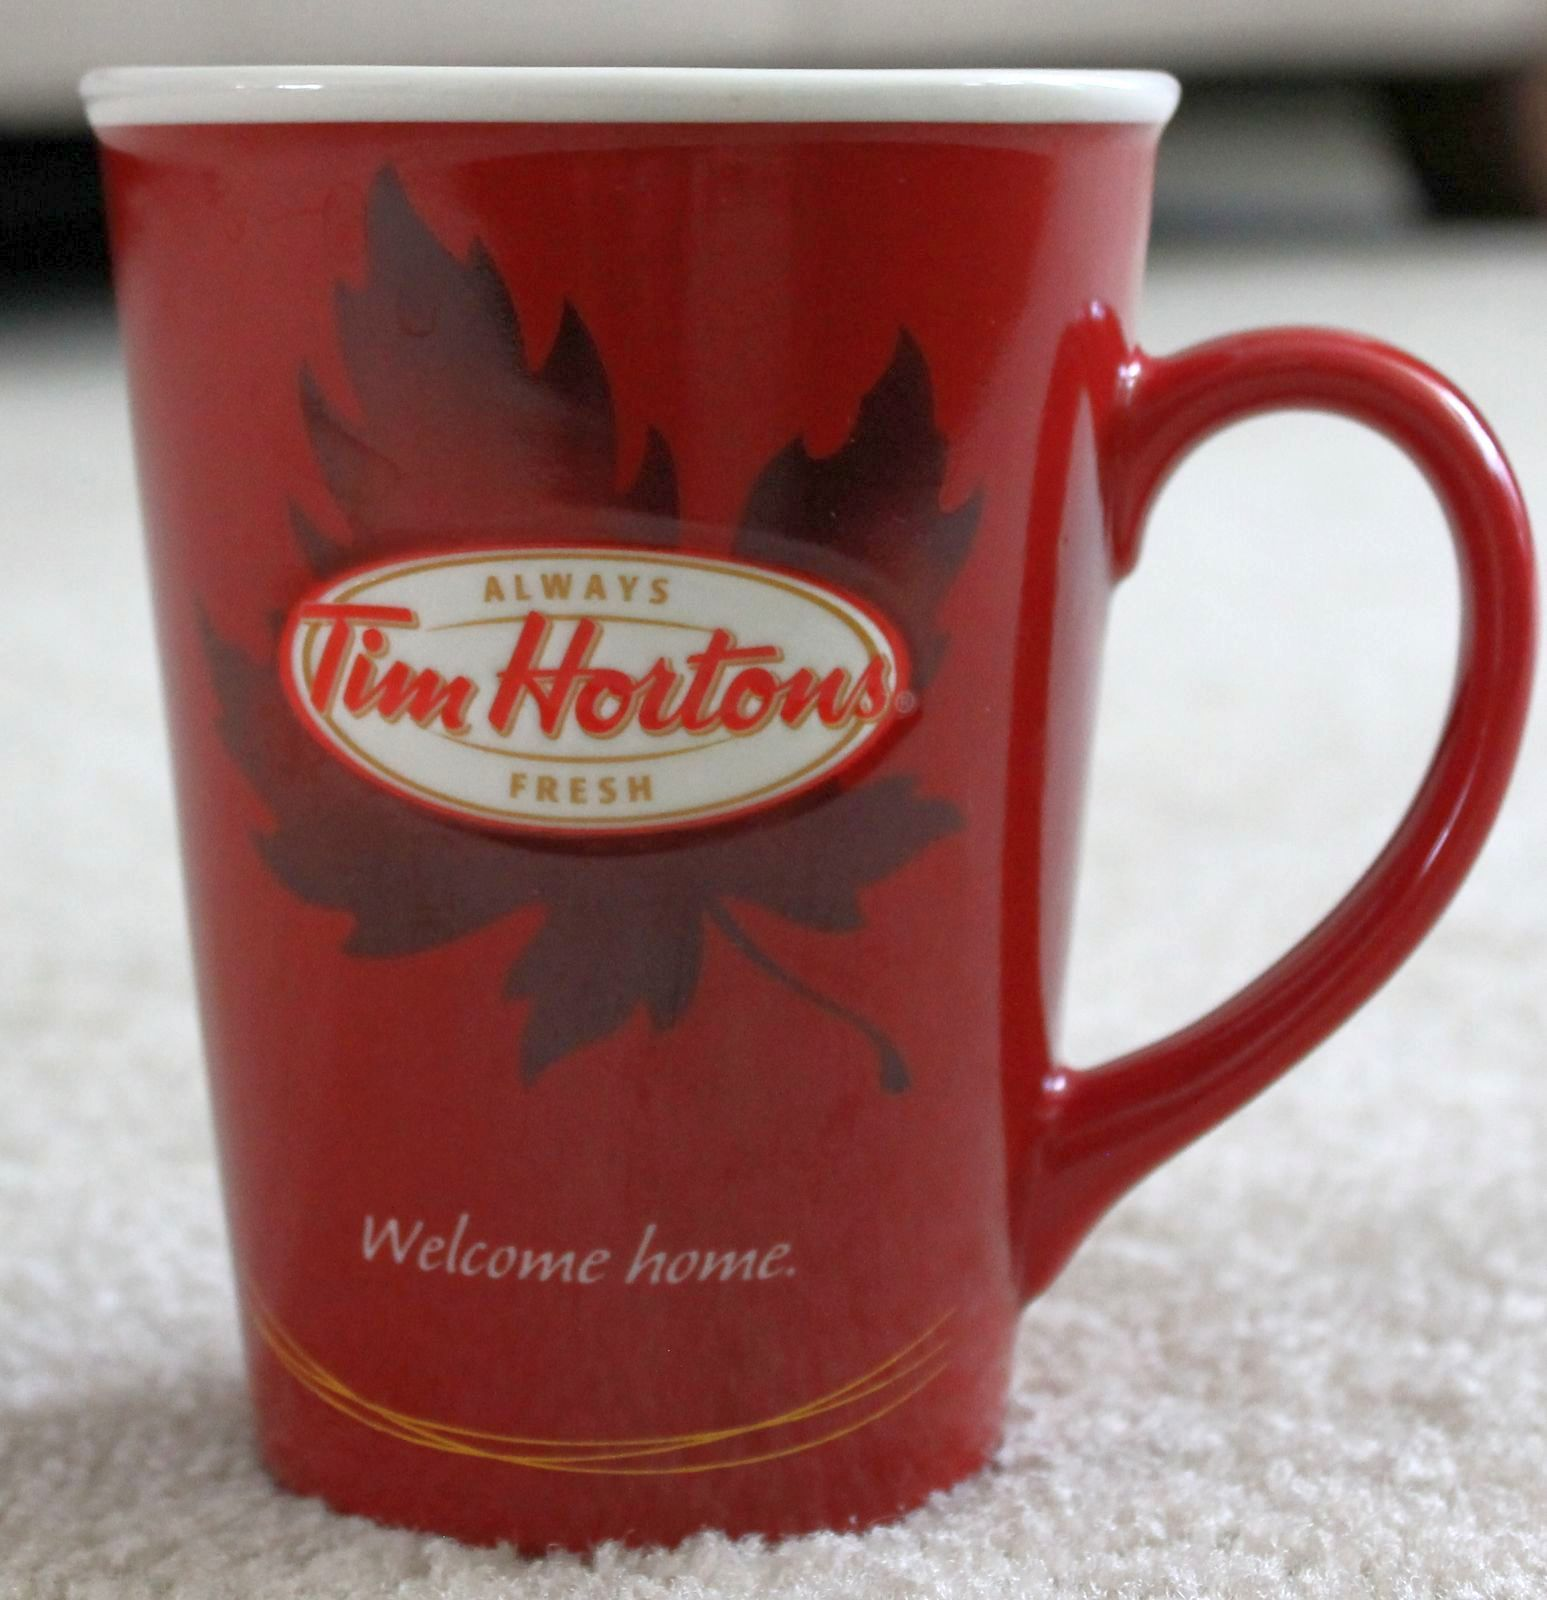 2011 Tim Hortons Horton's #011 Coffee Tea Welcome Home ...